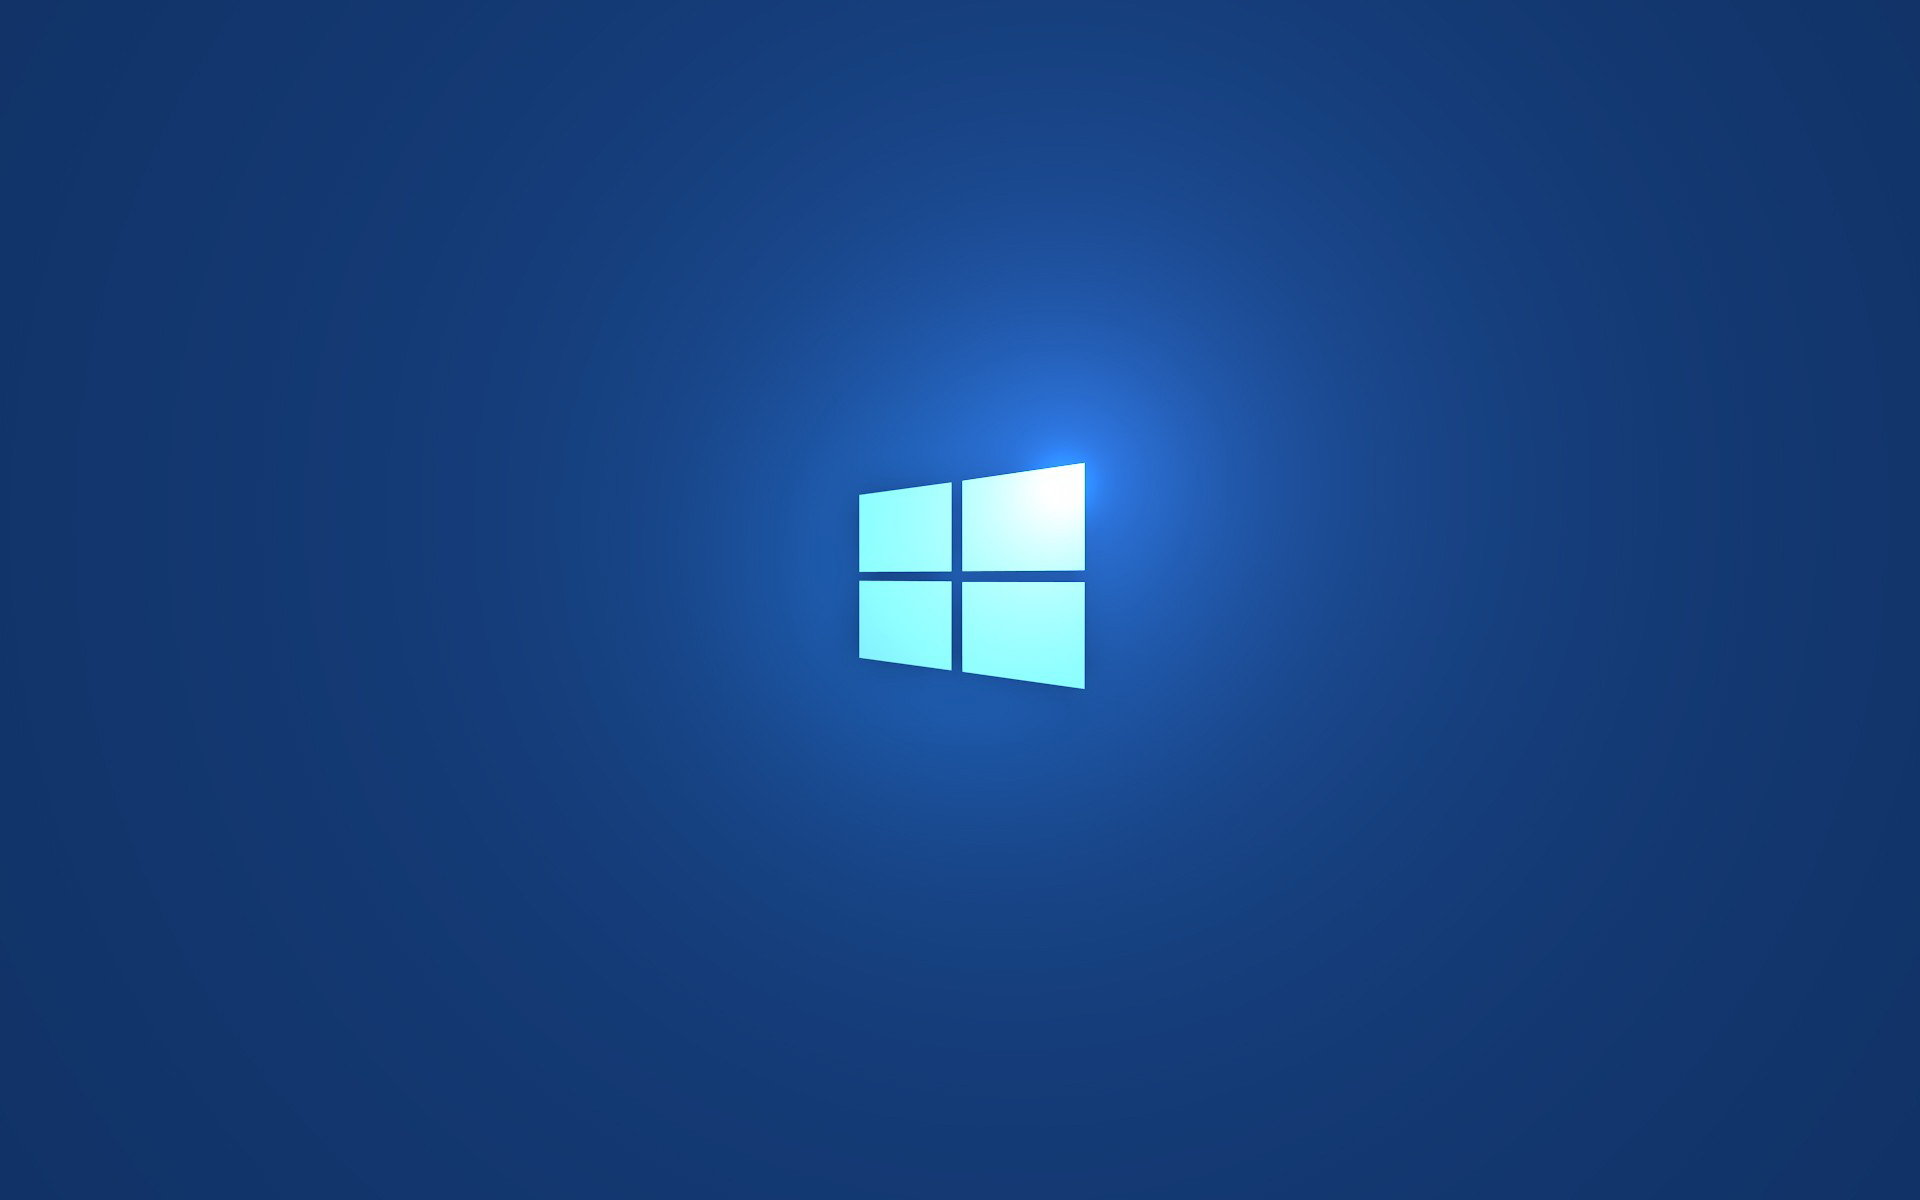 Windows 81 wallpapers HD for desktop backgrounds 1920x1200